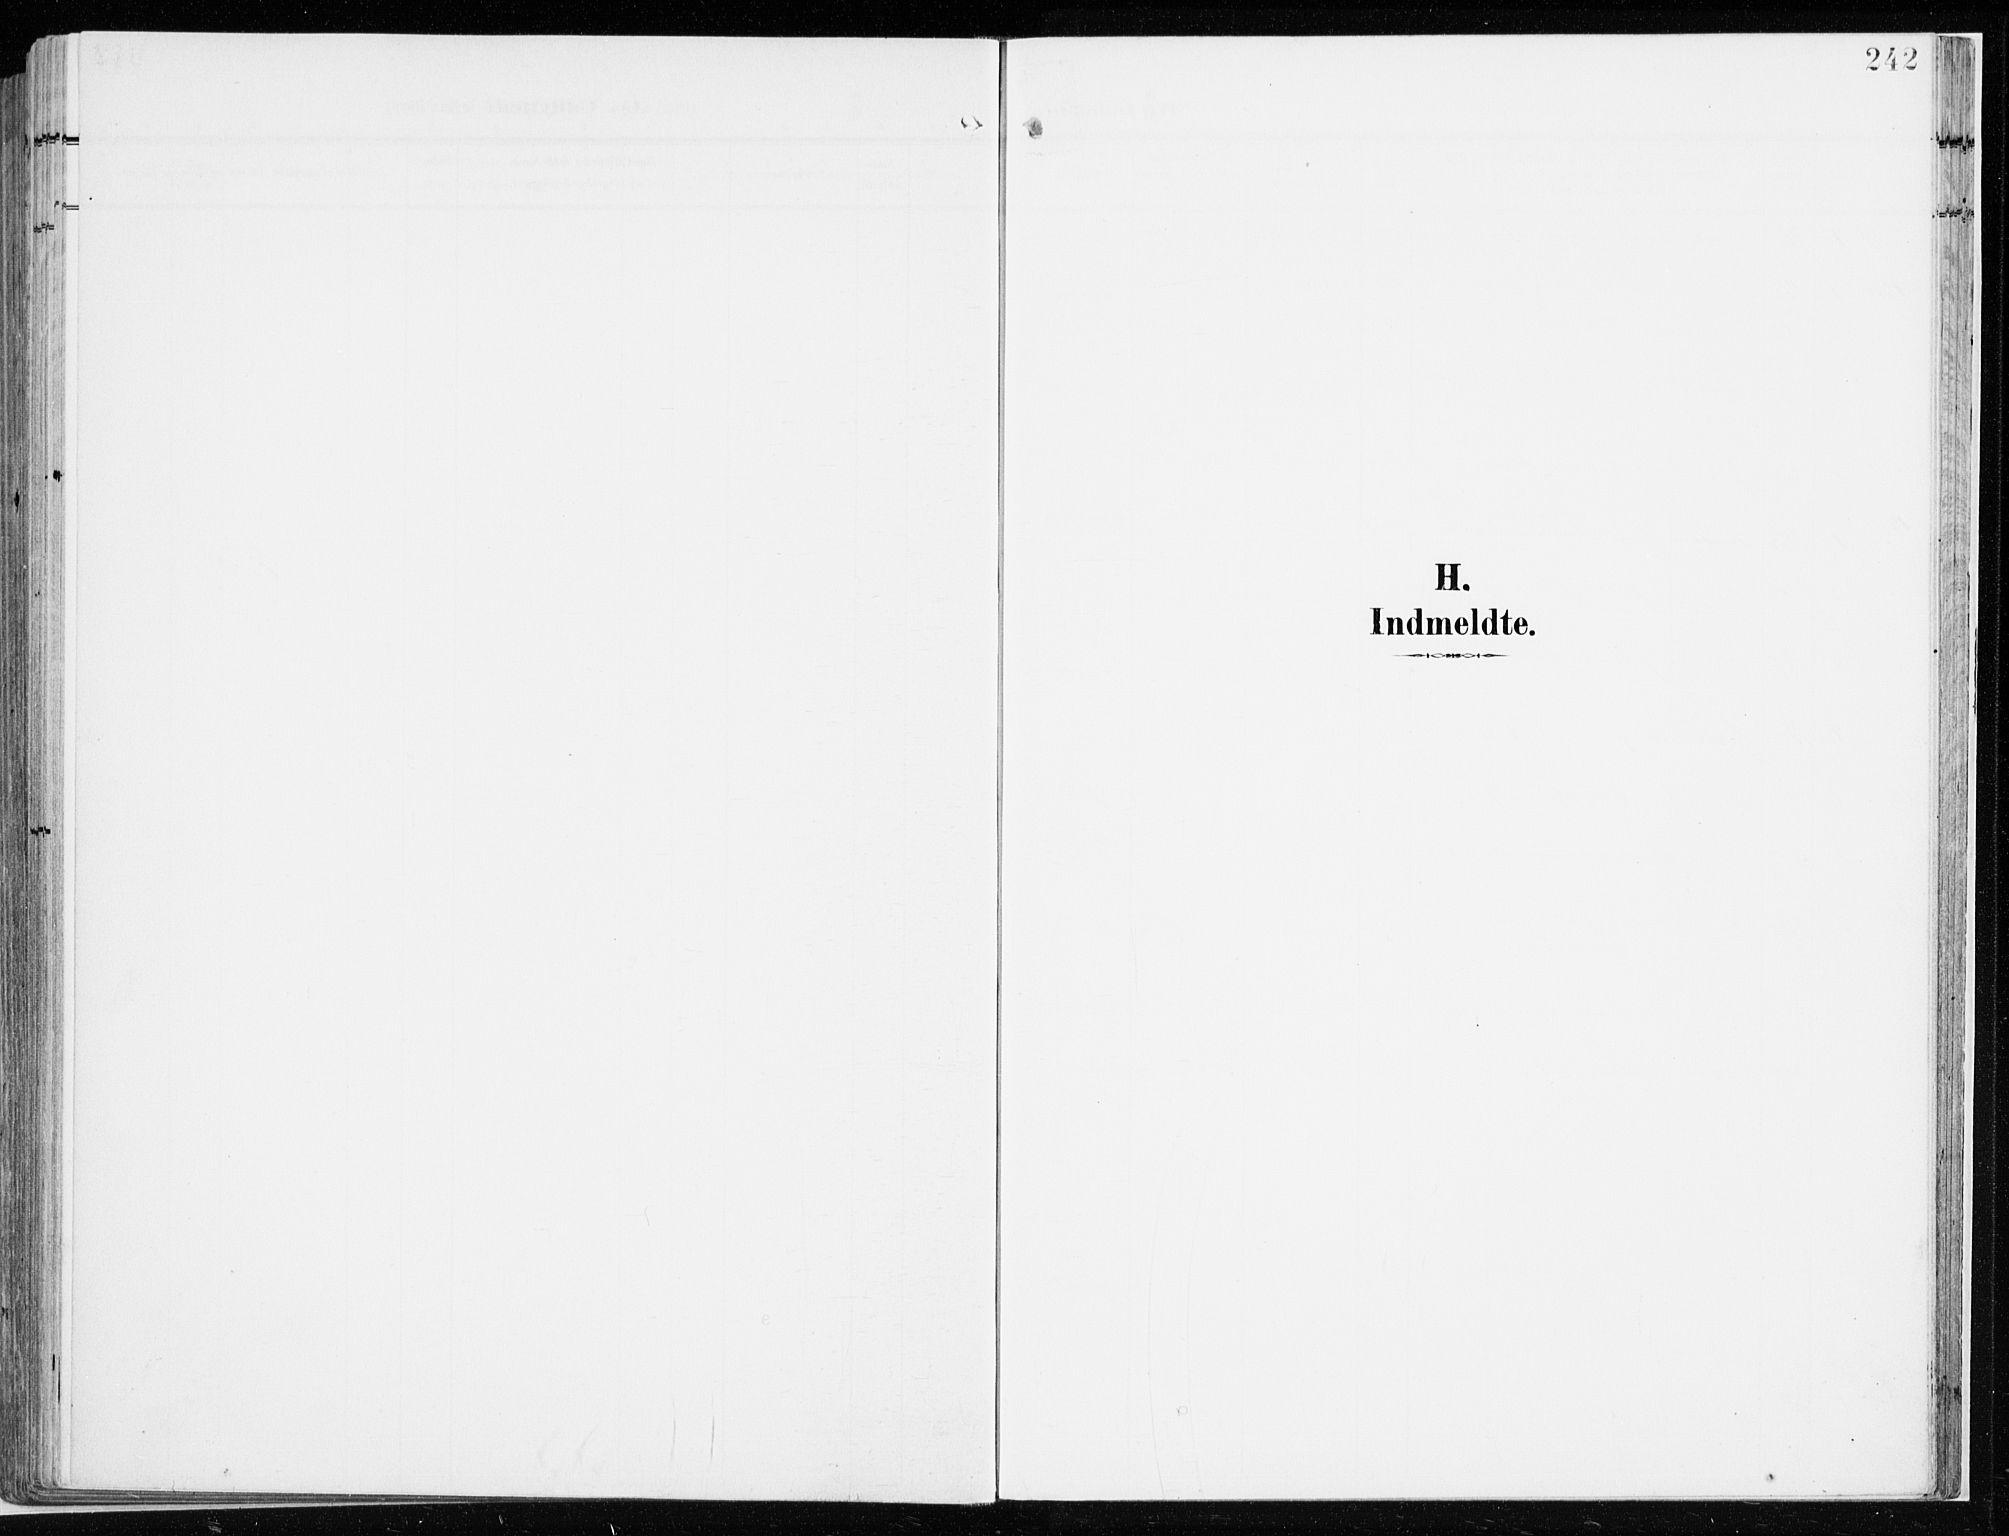 SAH, Løten prestekontor, K/Ka/L0011: Ministerialbok nr. 11, 1908-1917, s. 242